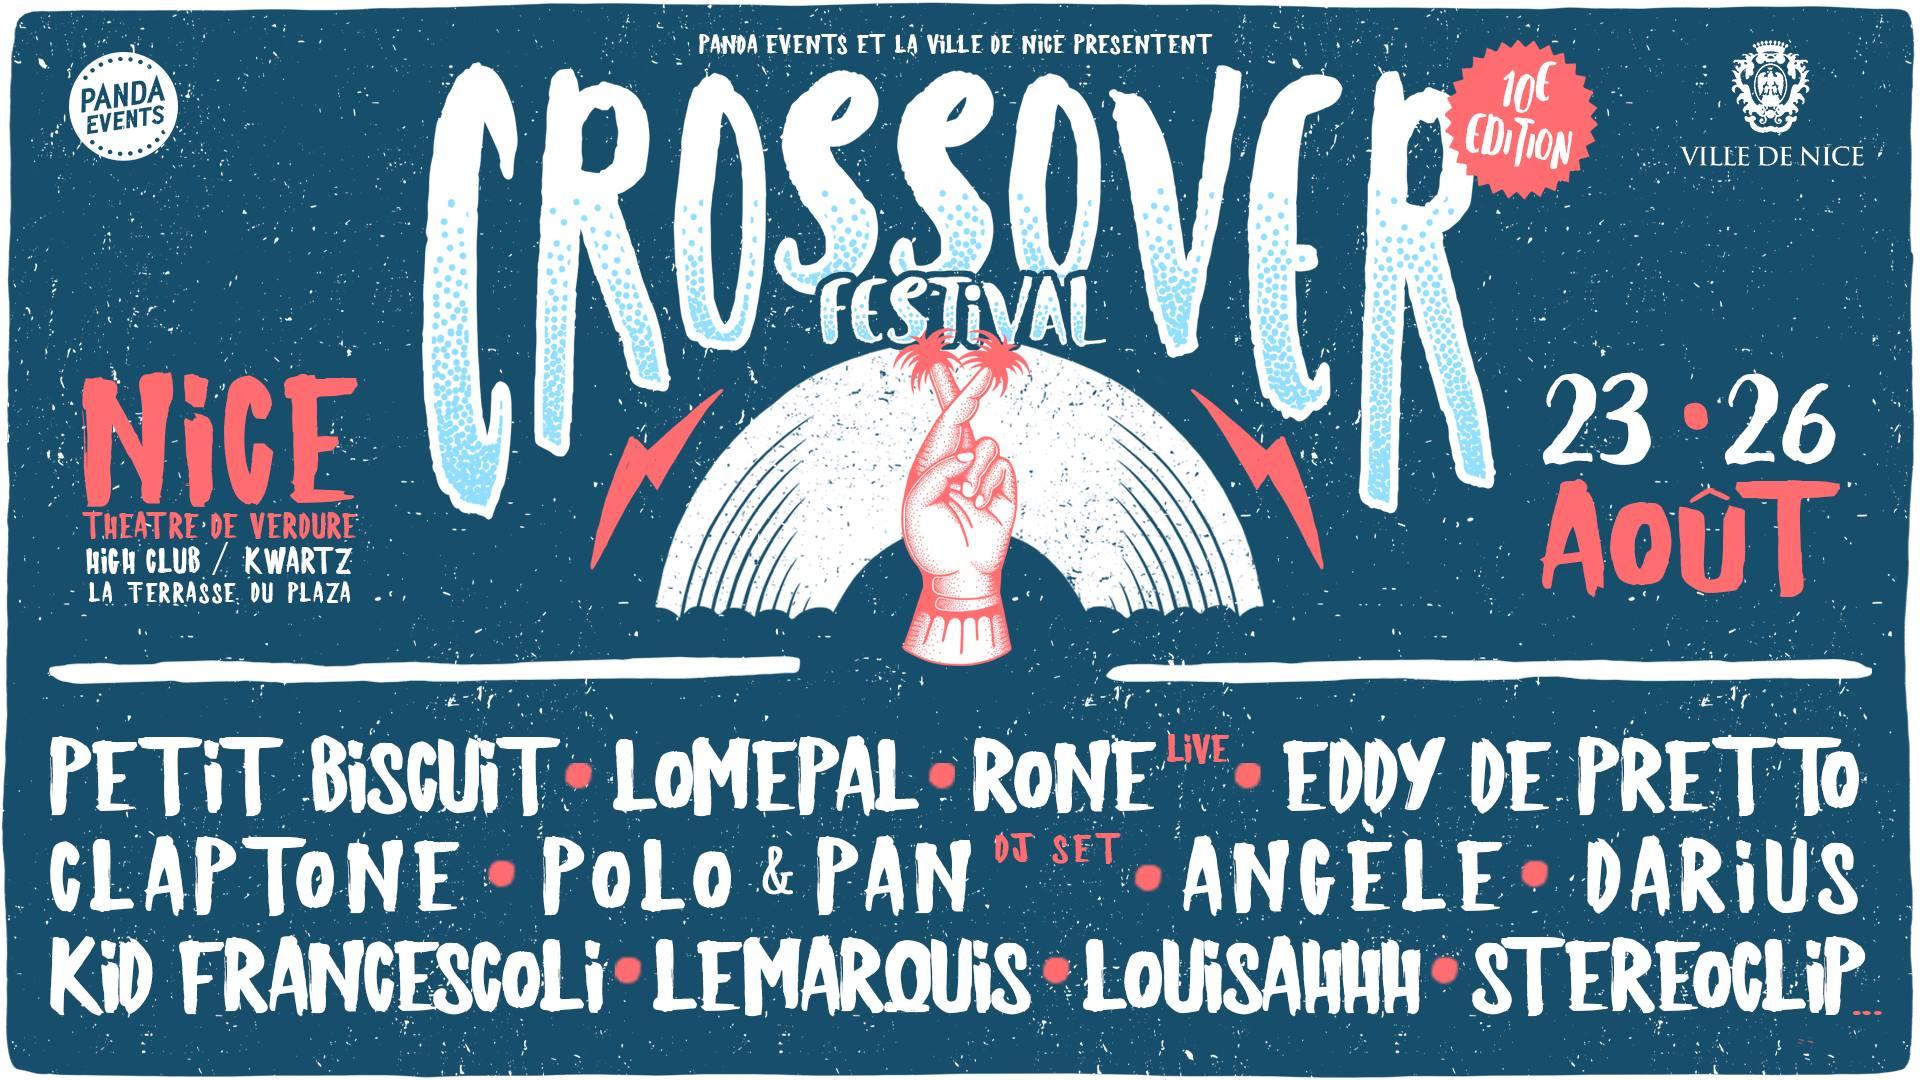 CROSSOVER FESTIVAL